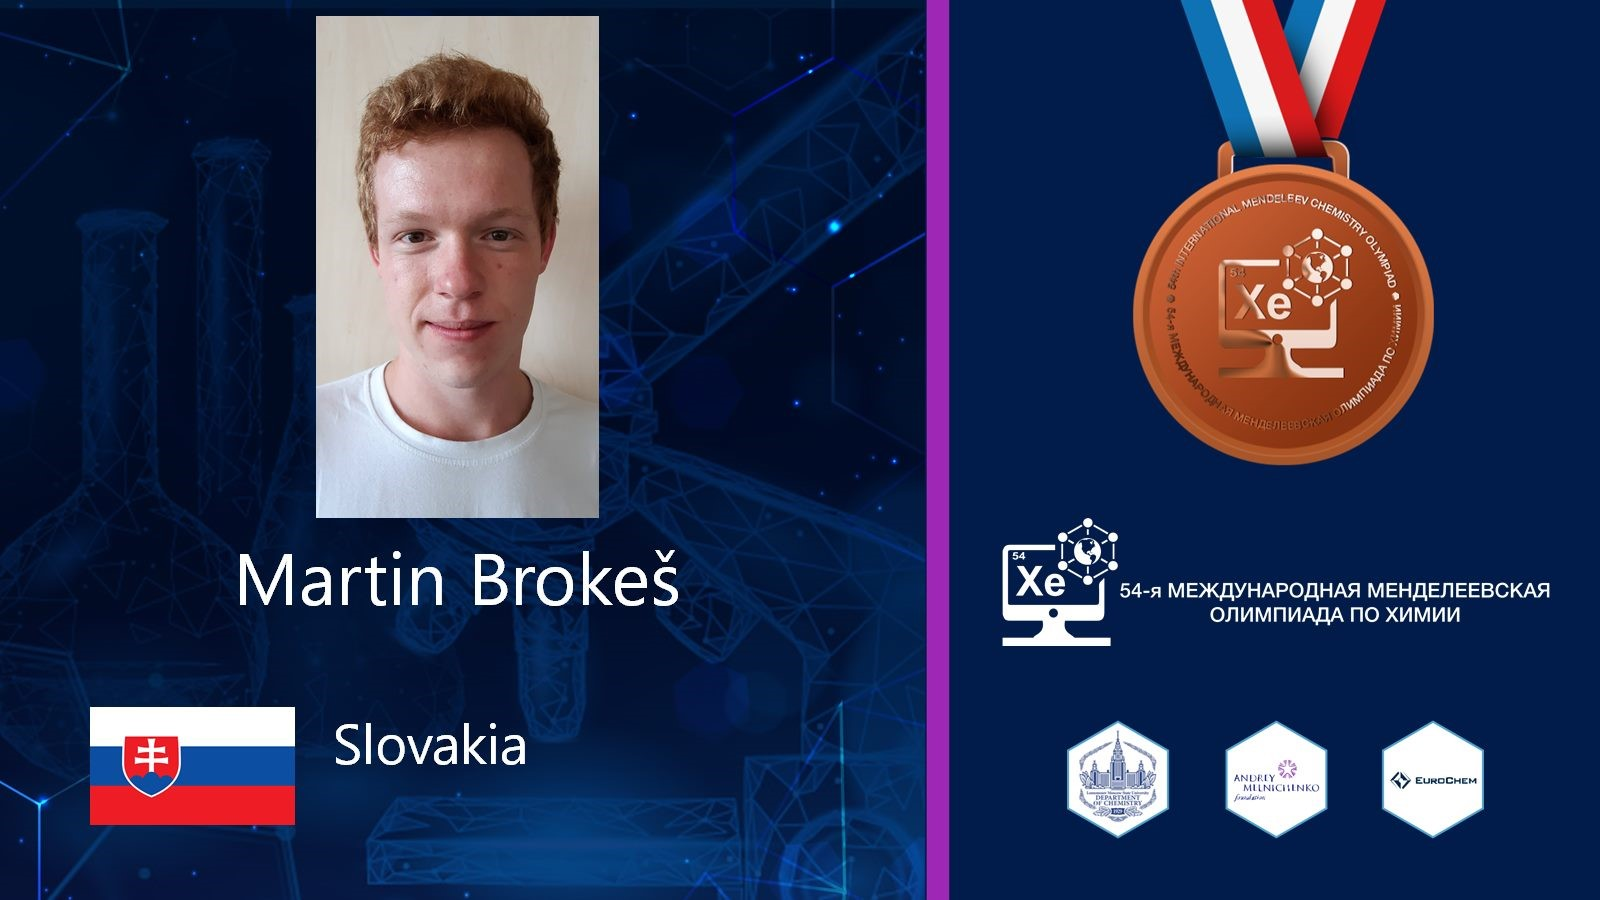 bronzova medaila brokes